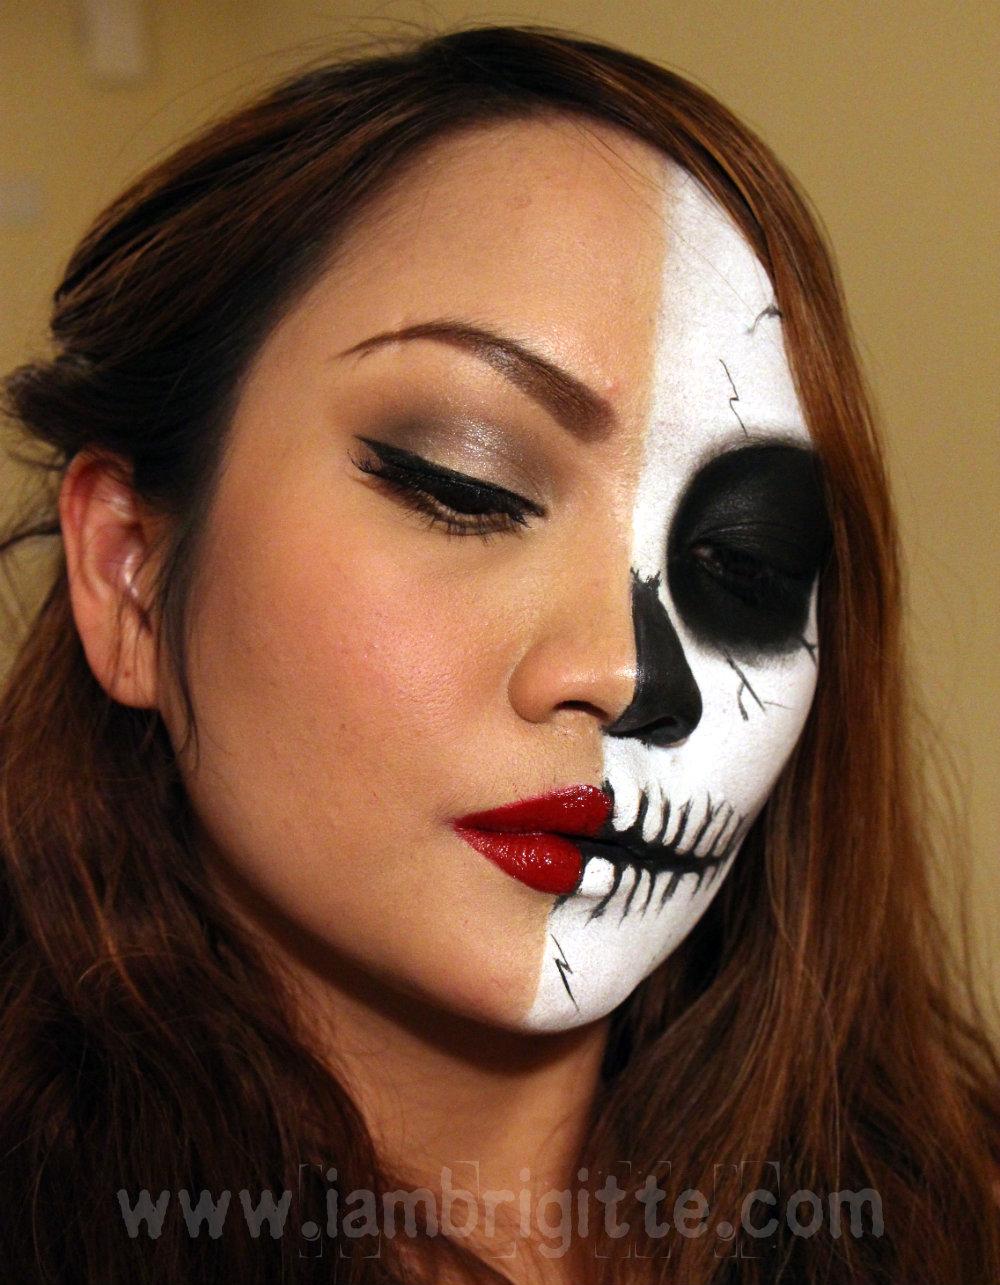 IAMBRIGITTE : Playing with Makeup: Pin Up Girl/Skull Look - Cheap Halloween Makeup